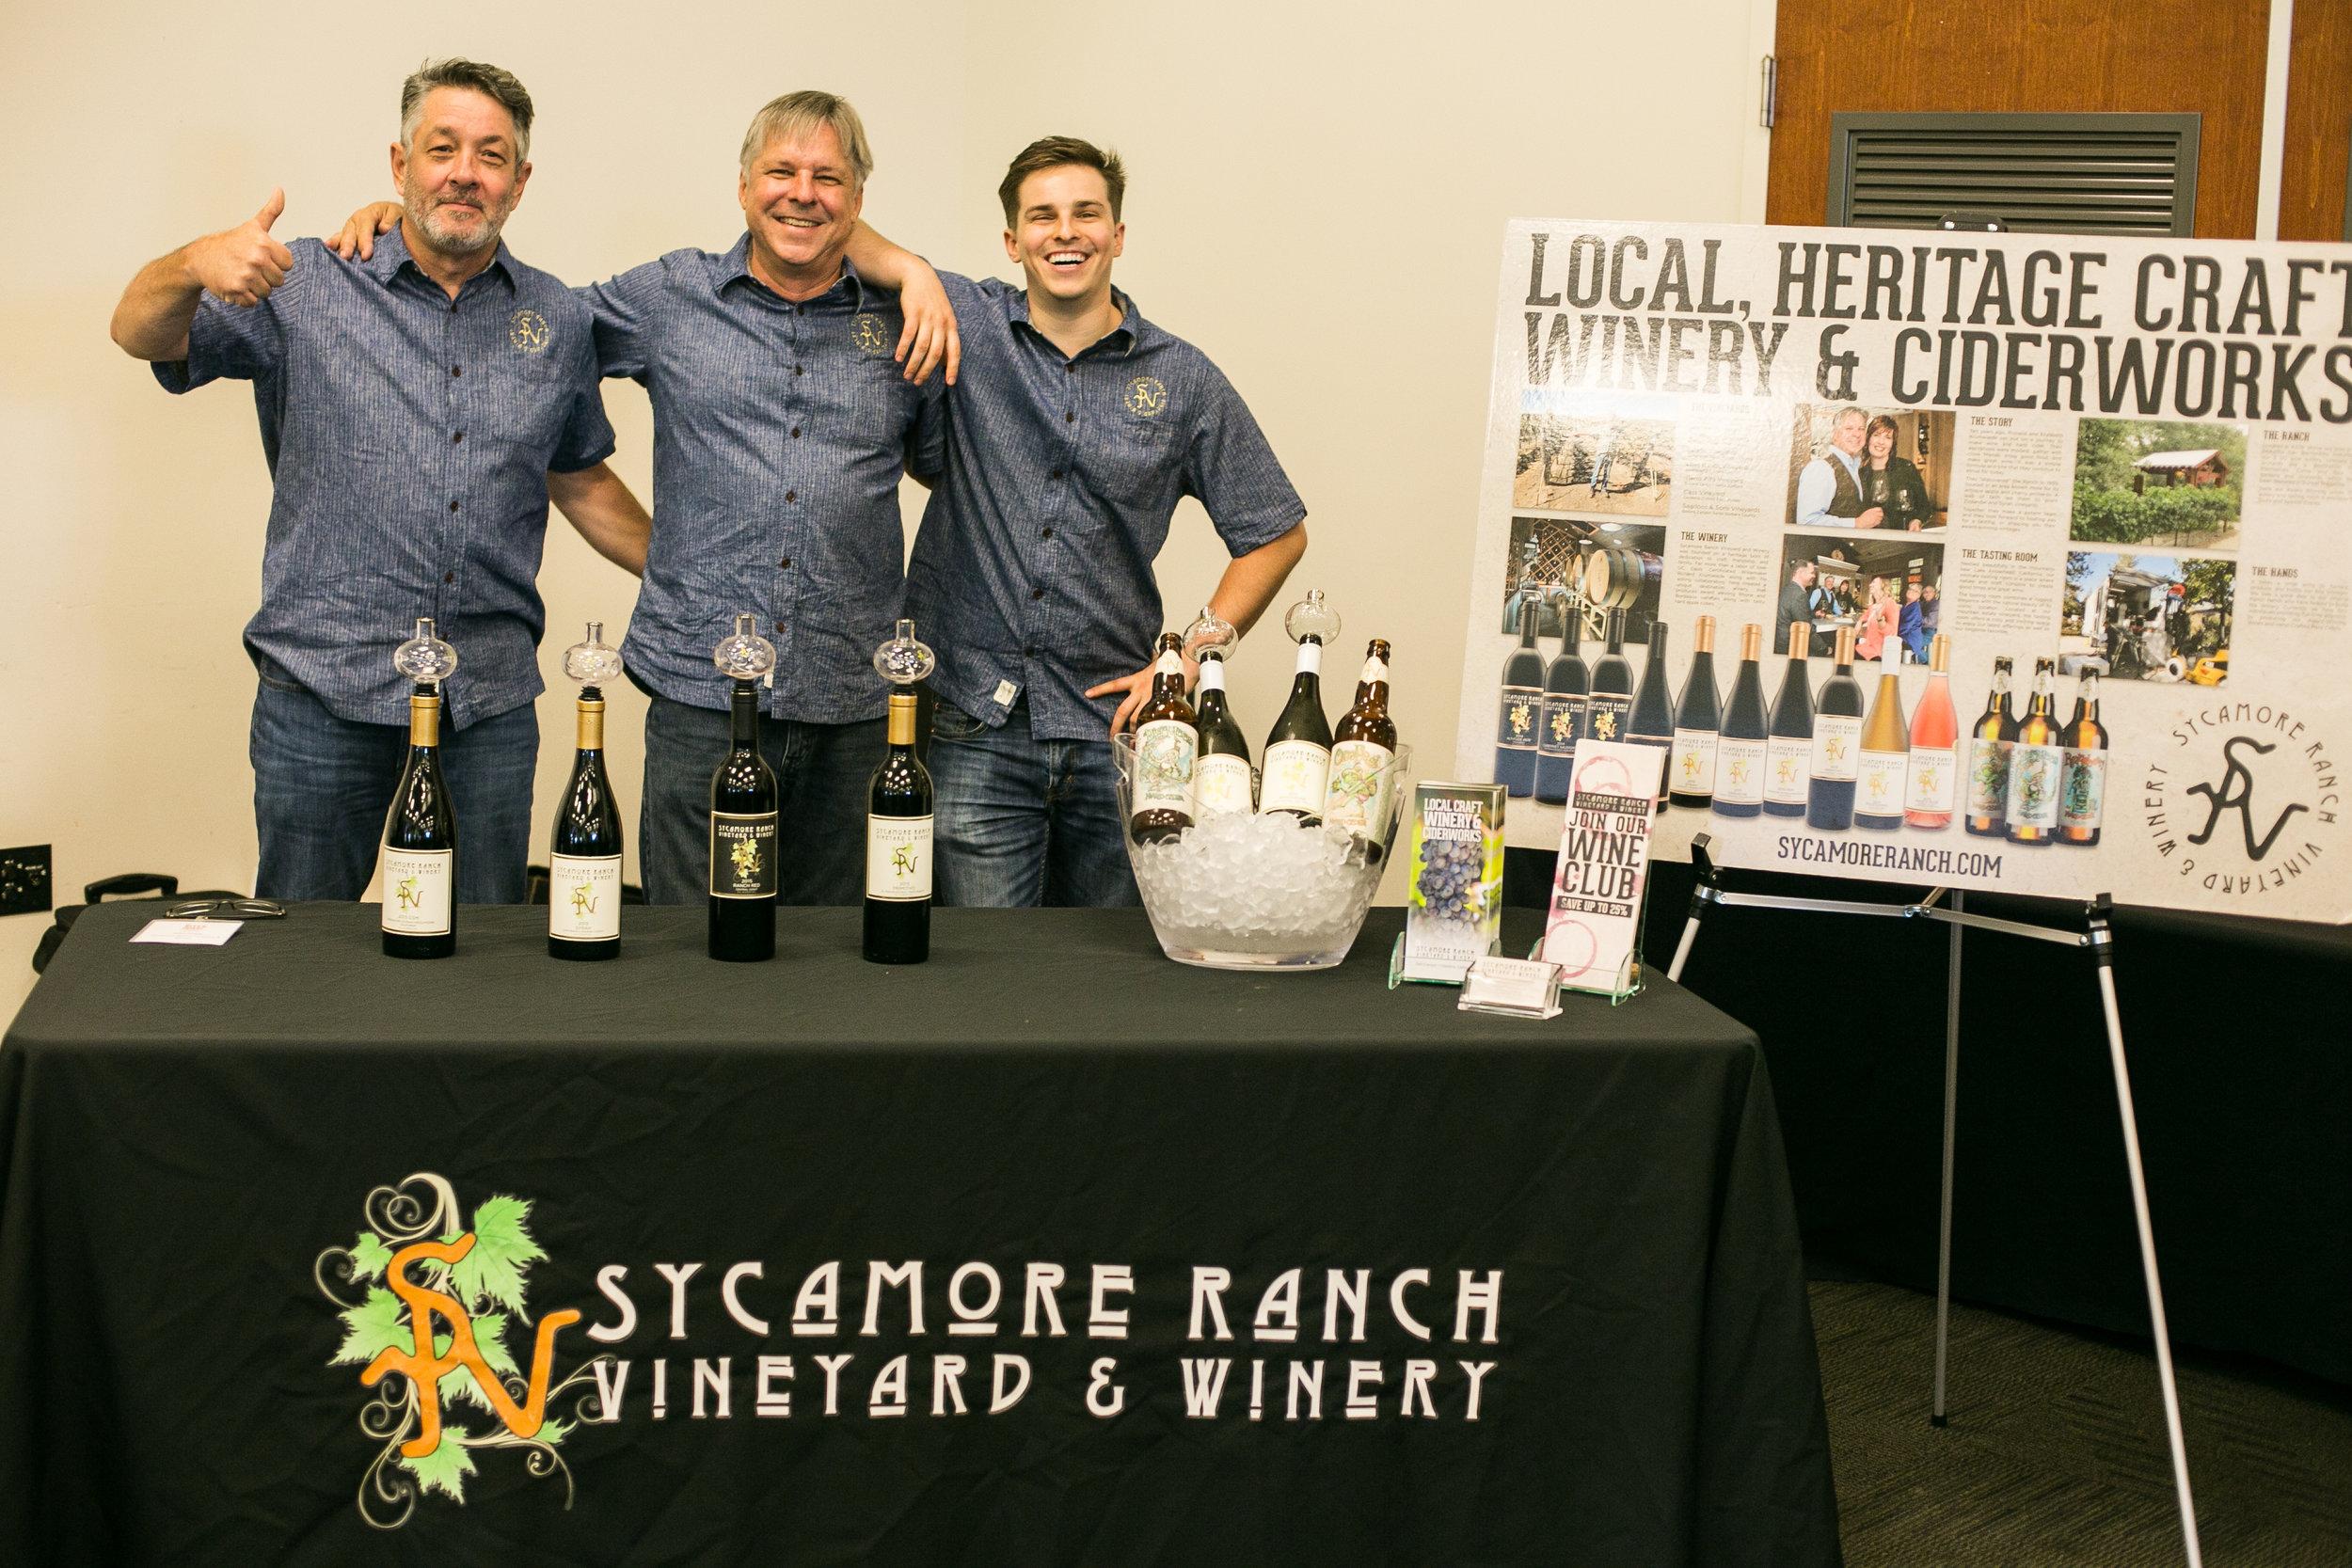 Sycamore Ranch Vineyard & Winery